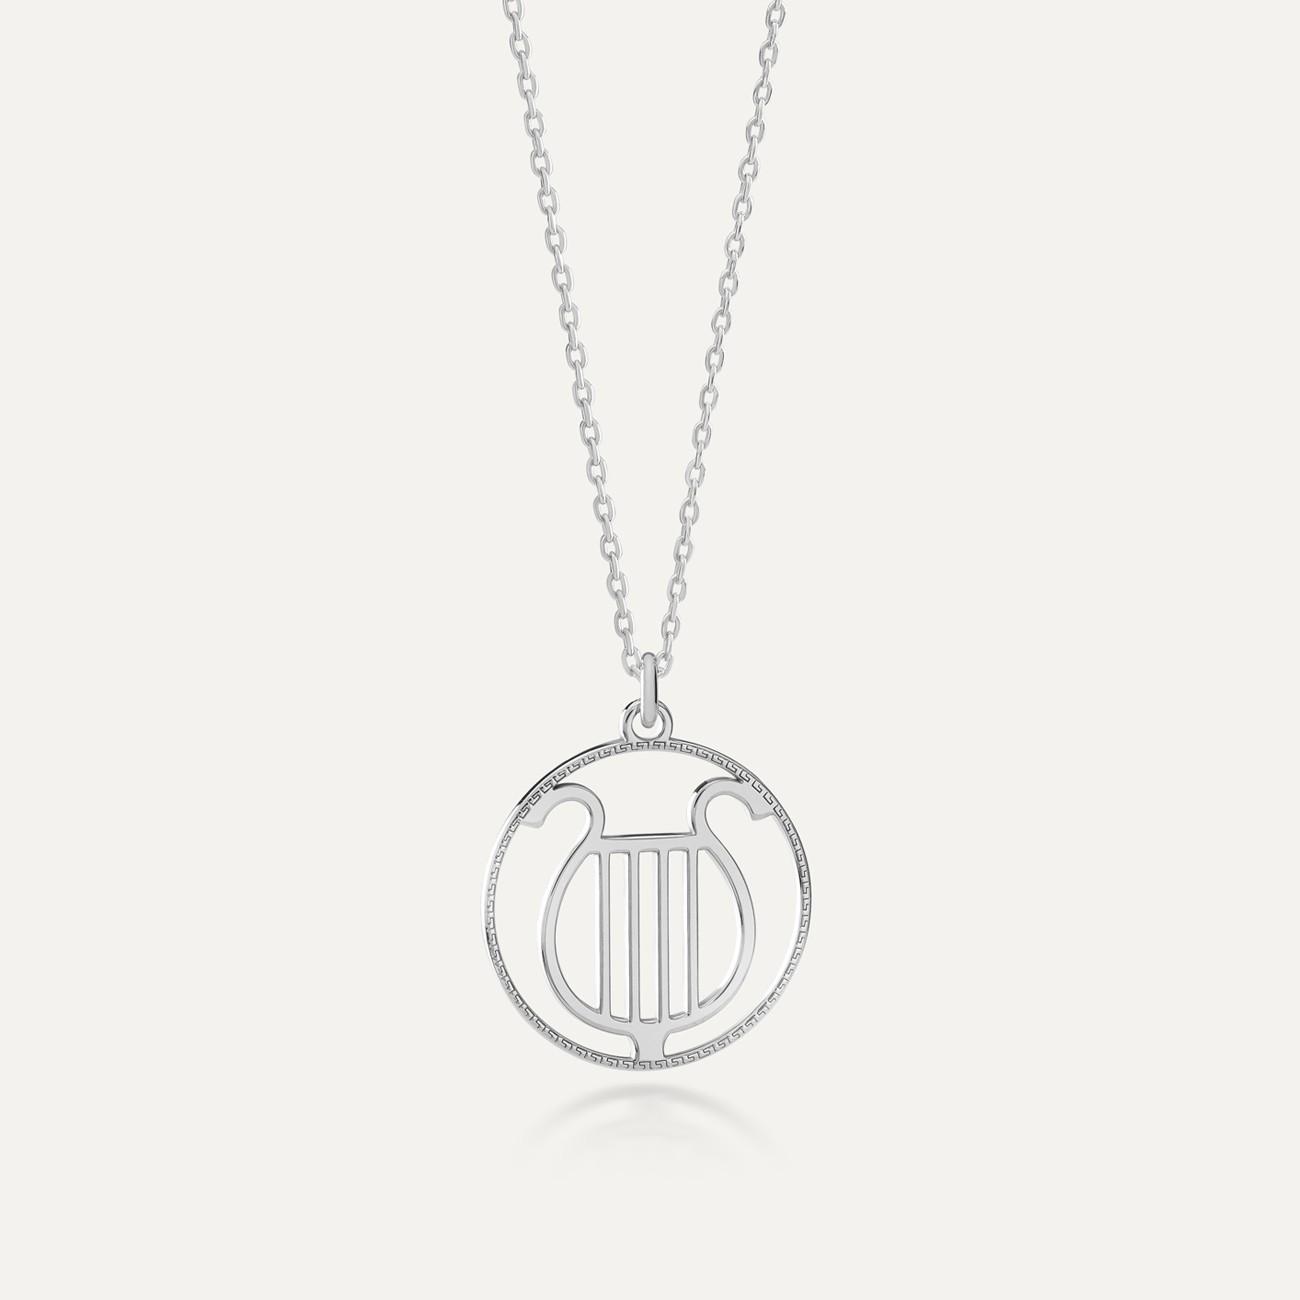 Srebrny naszyjnik bogowie greccy - Apollo MON DÉFI